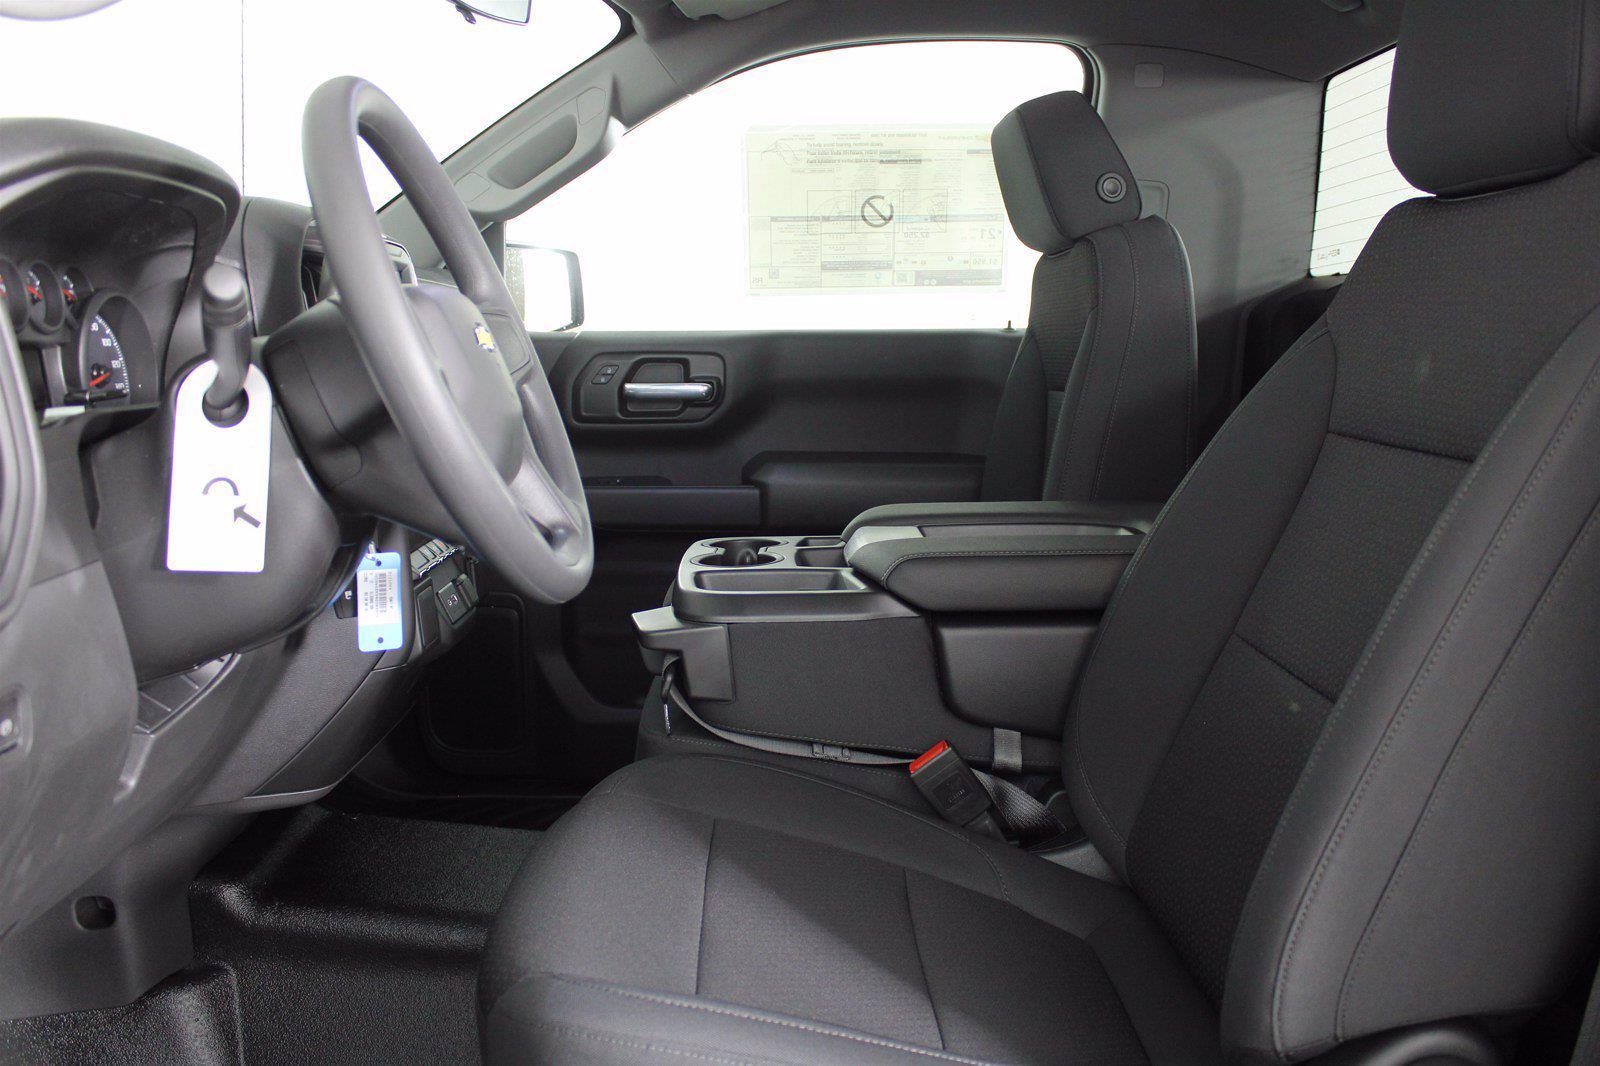 2021 Chevrolet Silverado 1500 Regular Cab 4x2, Pickup #D111066 - photo 14